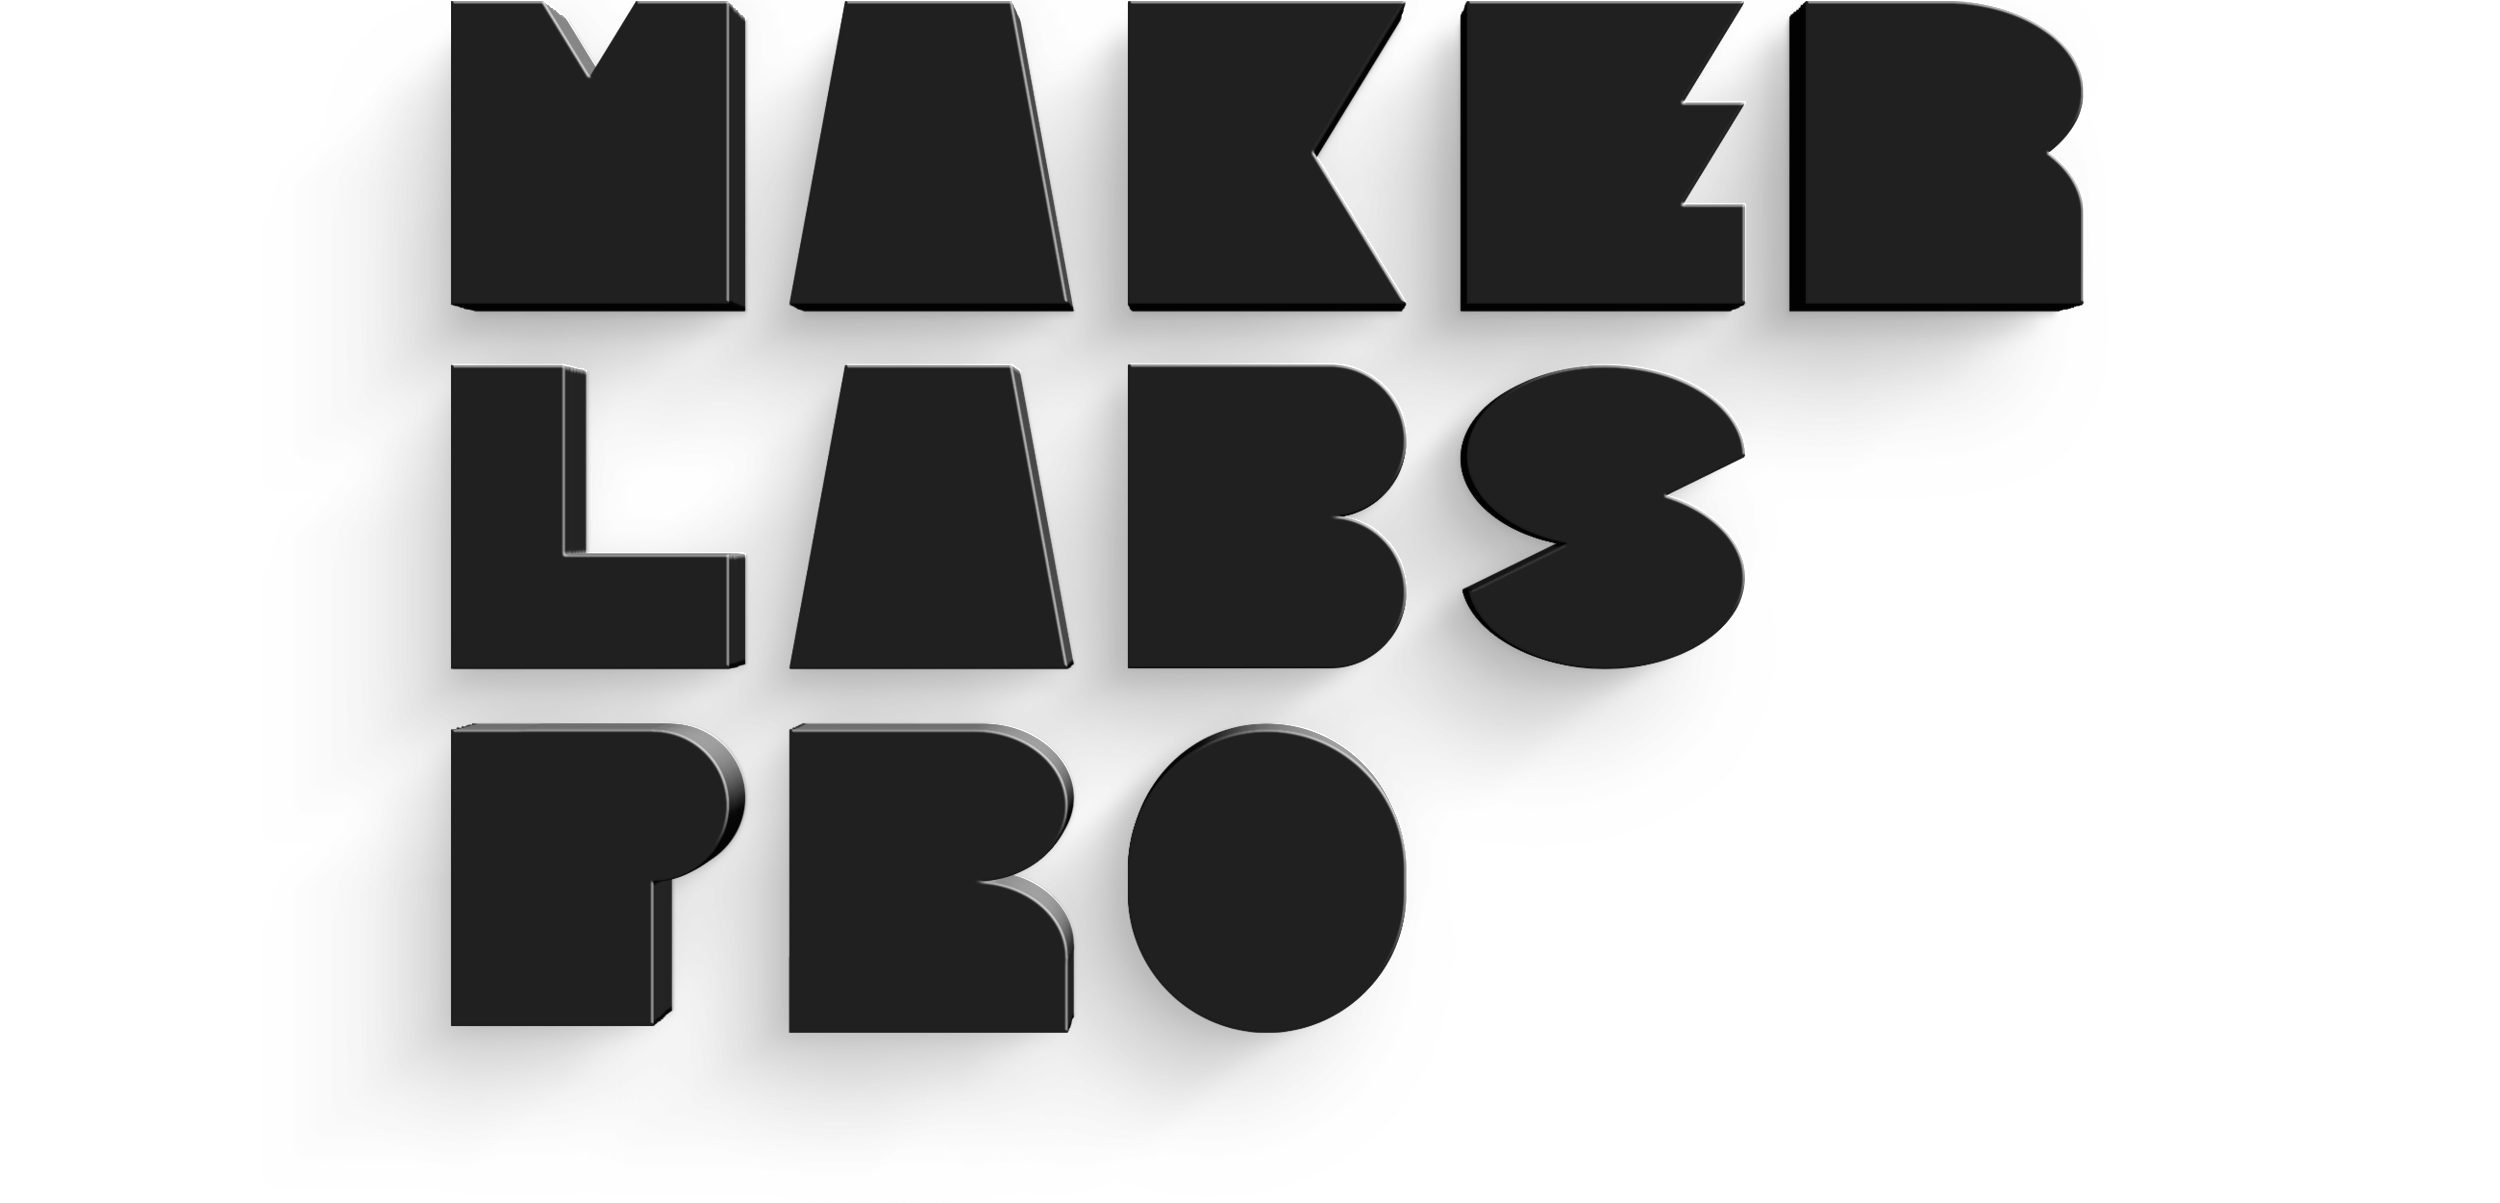 MakerLabsPro_HeroTextGreySML02.png